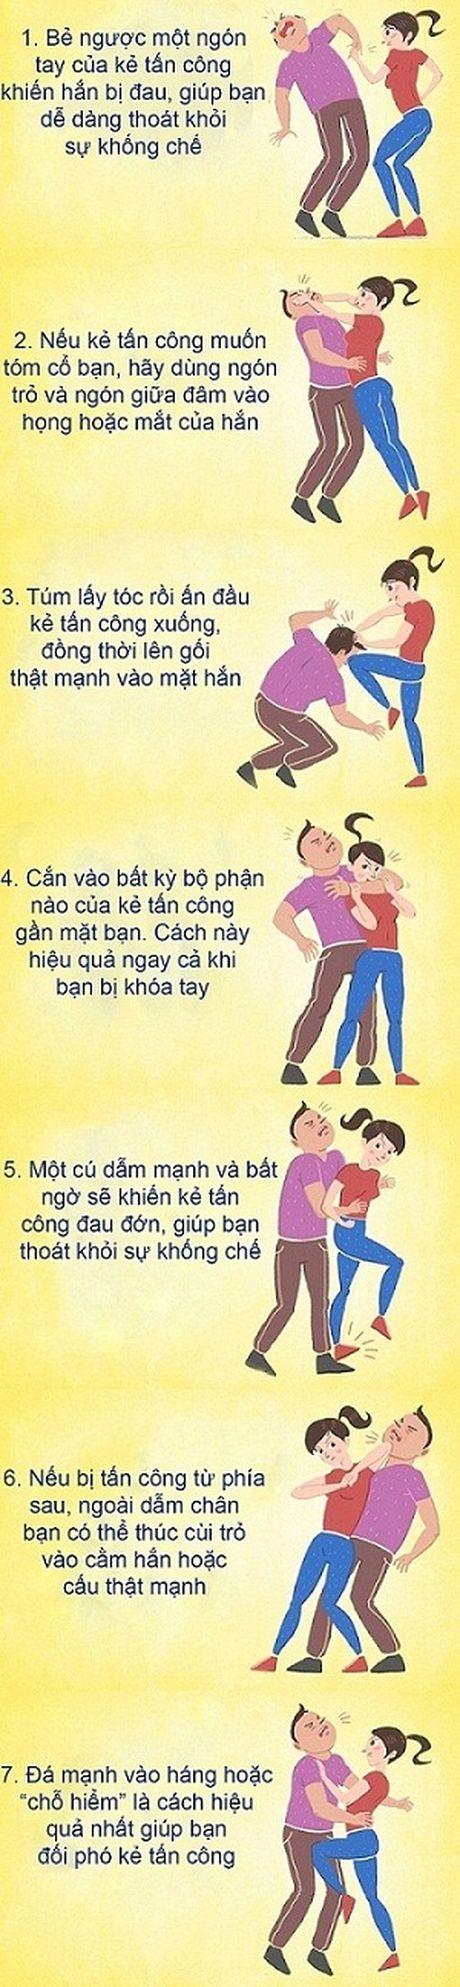 Infographic: 7 cach giup ban thoat khoi ke khong che - Anh 1